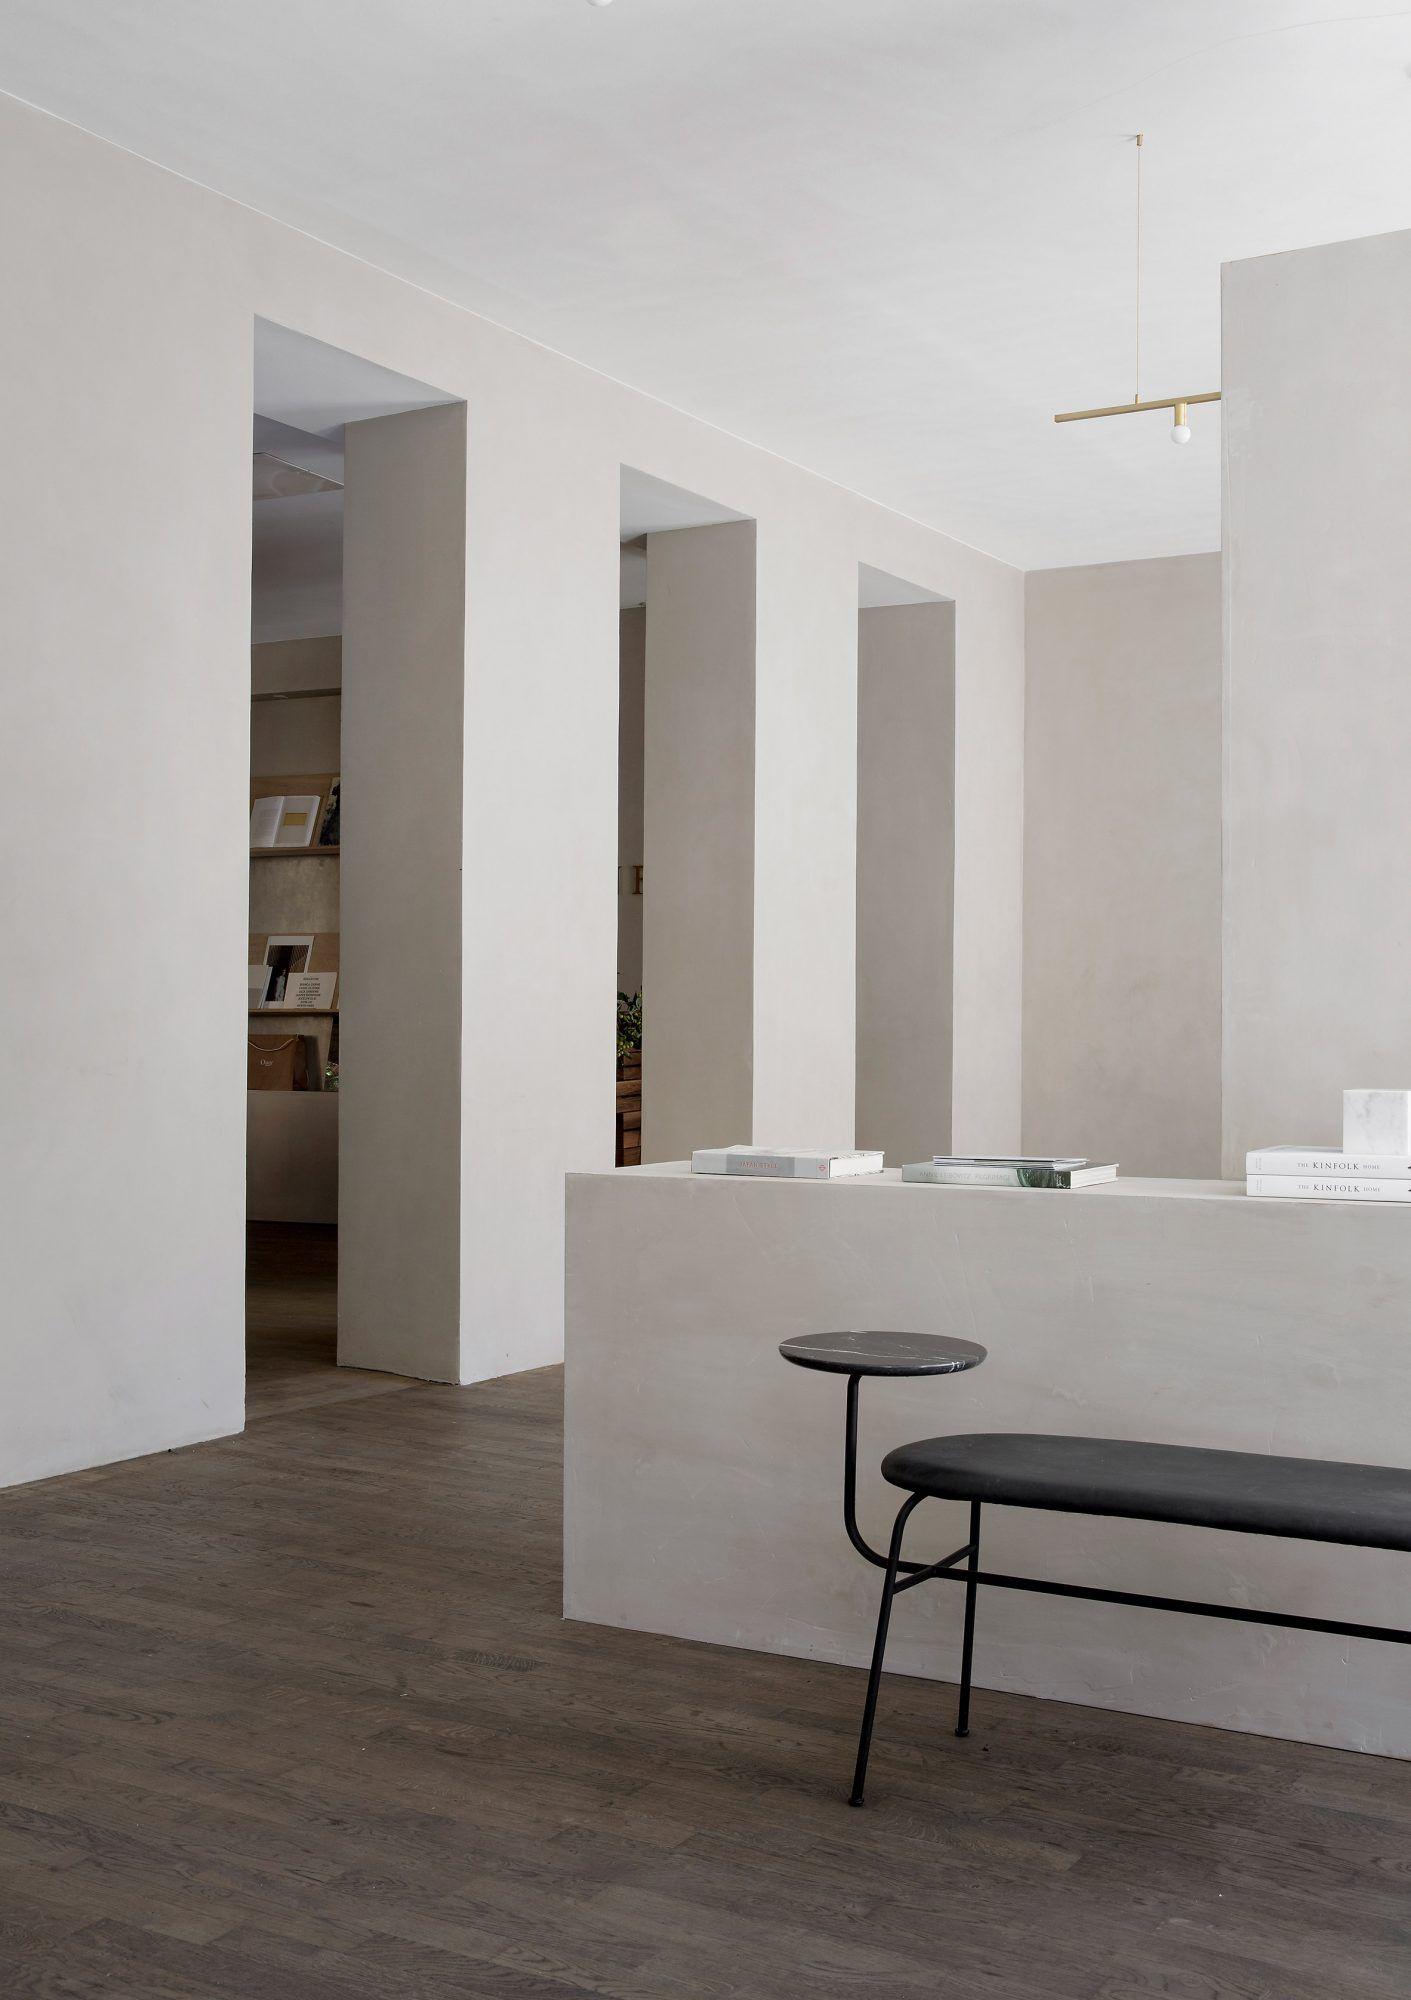 Kinfolk Gallery – Minimalissimo